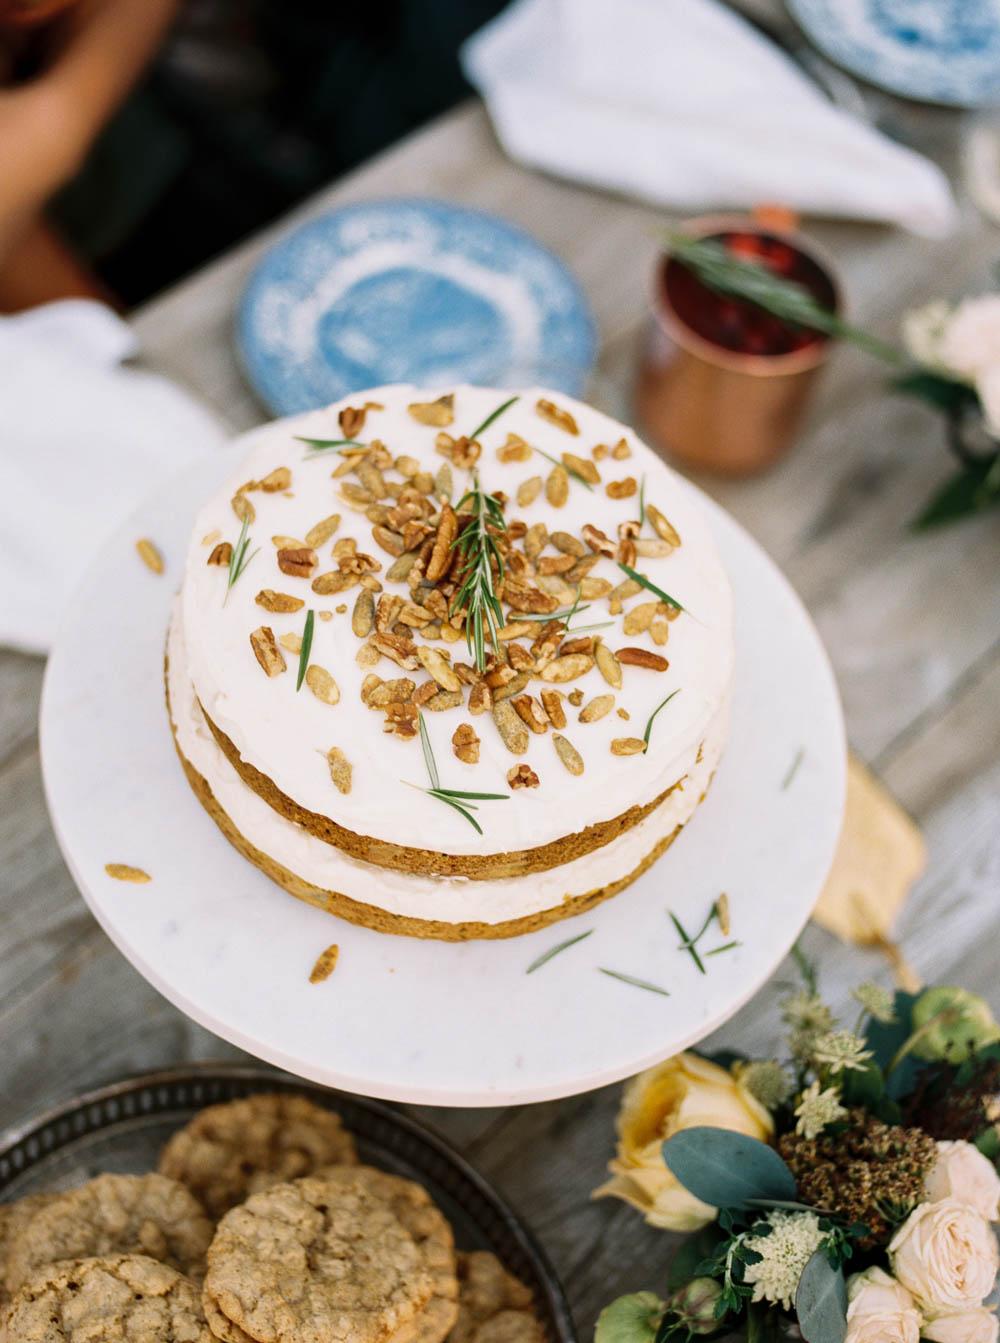 Harvest Cake // Thanksgiving Inspiration Tablescape